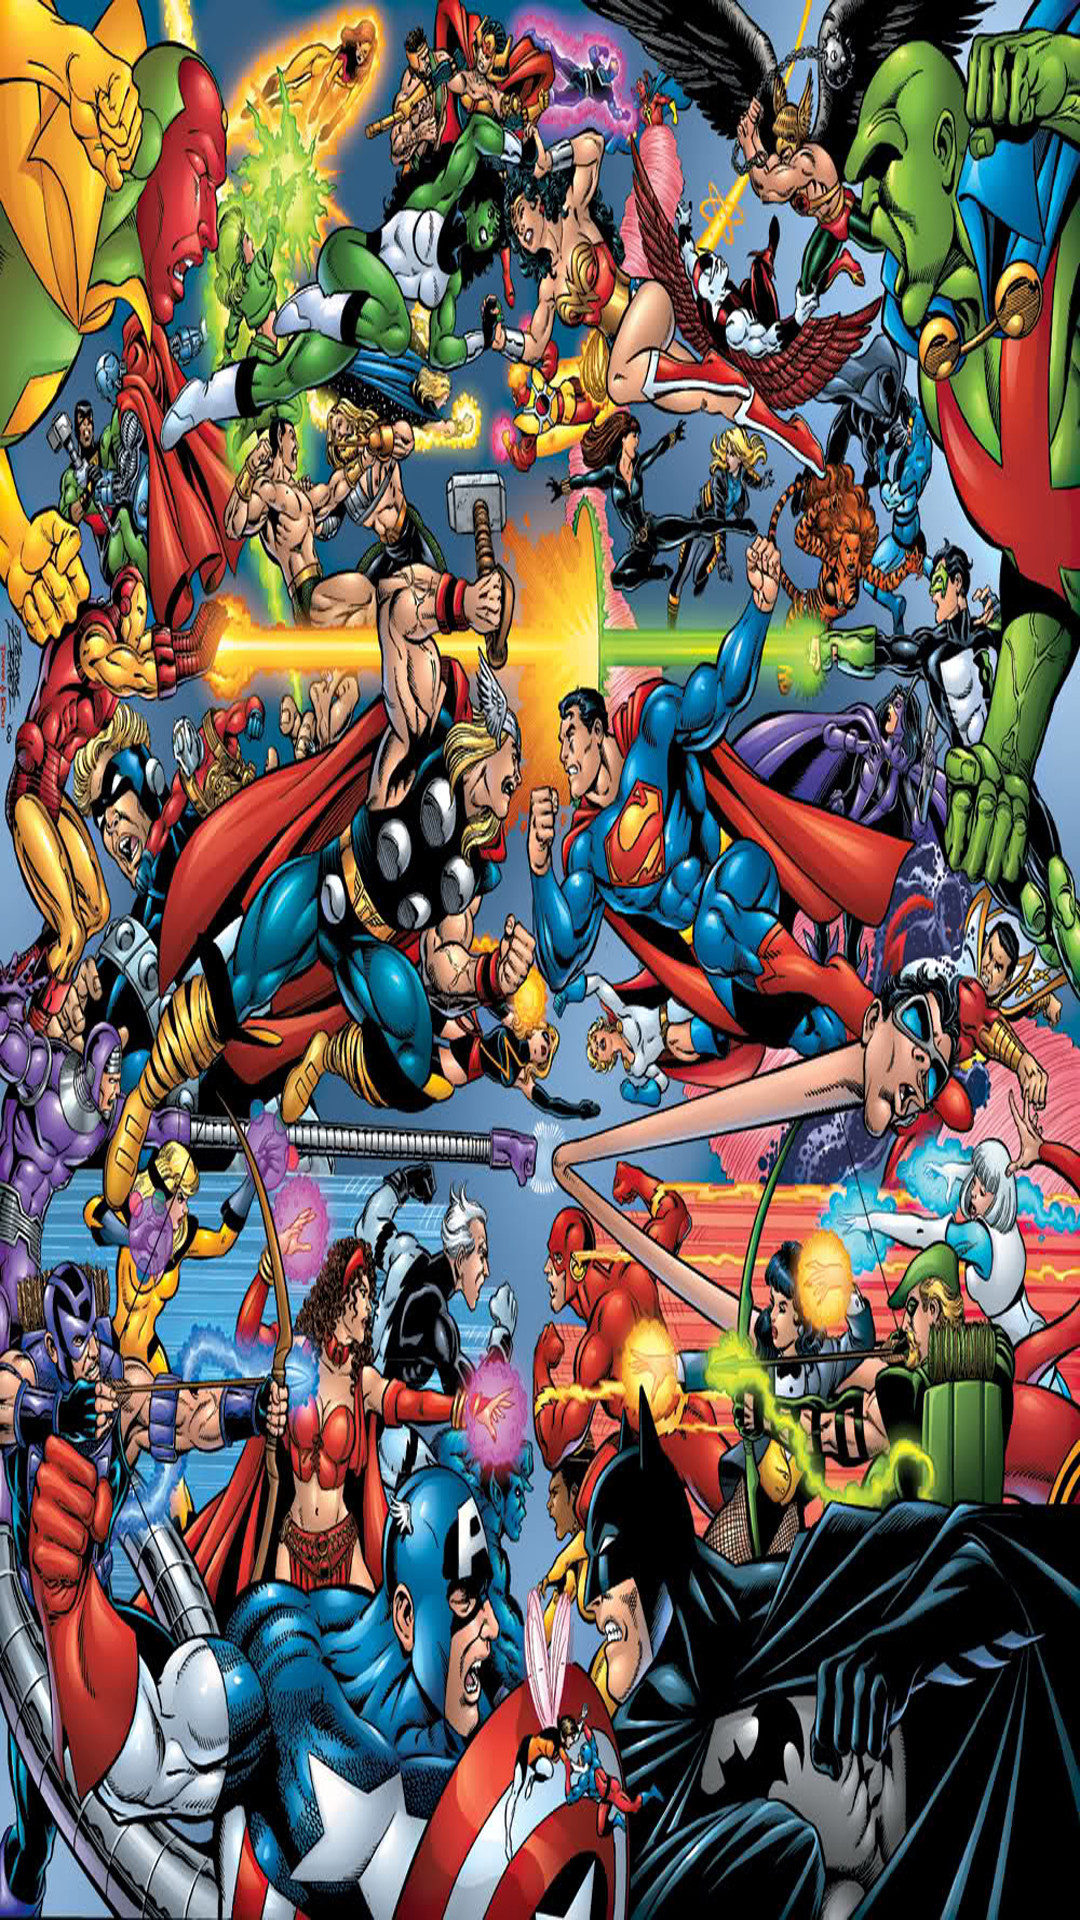 Marvel Phone Wallpaper   Dc Vs Marvel Wallpaper Android 133261 1080x1920